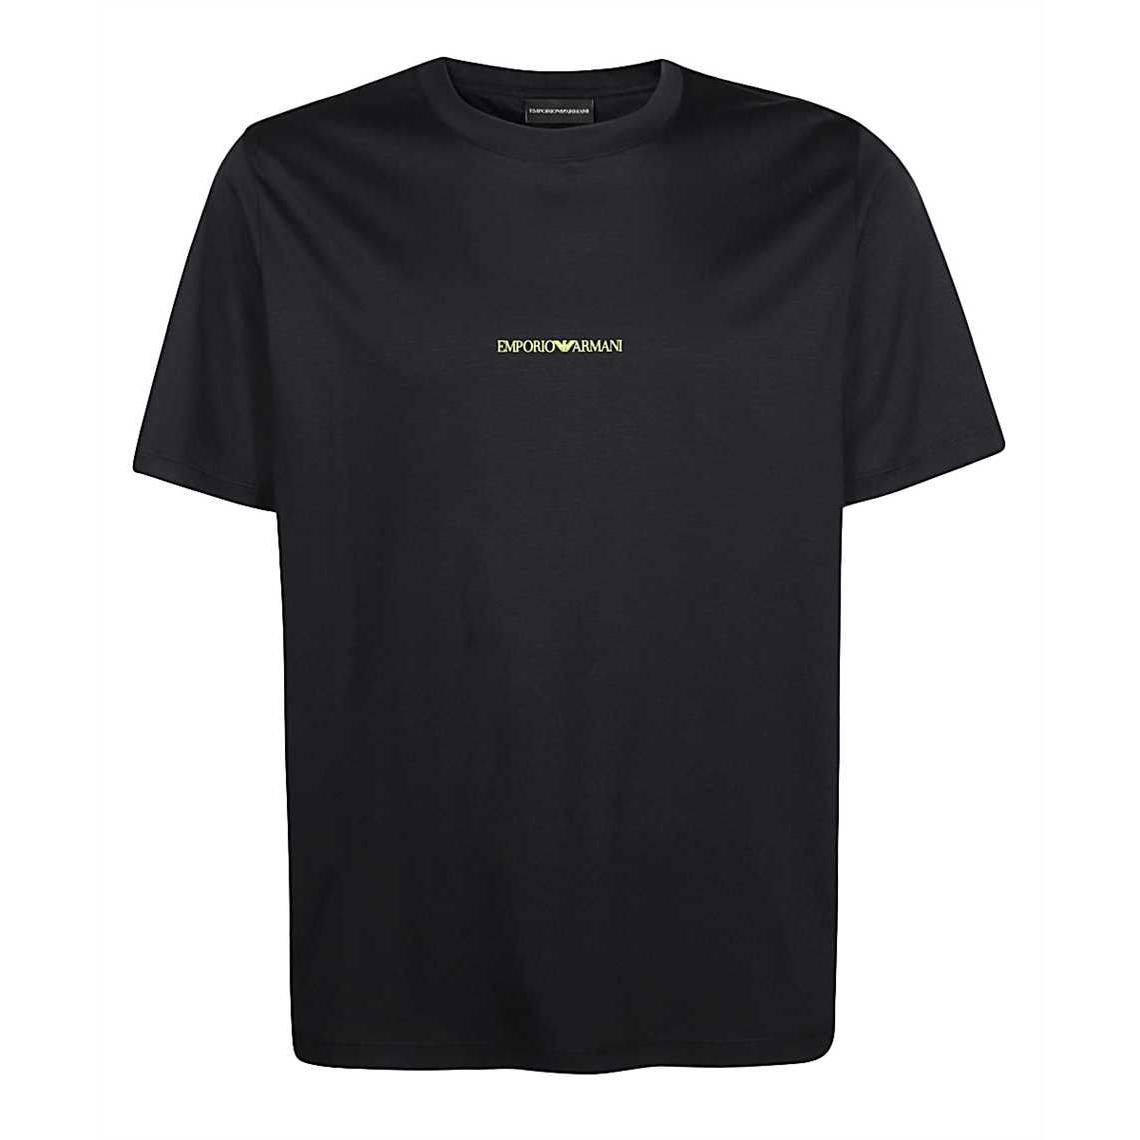 تیشرت آستین کوتاه مردانه امپریو آرمانی مدل 3H1T781JSTZ-0922